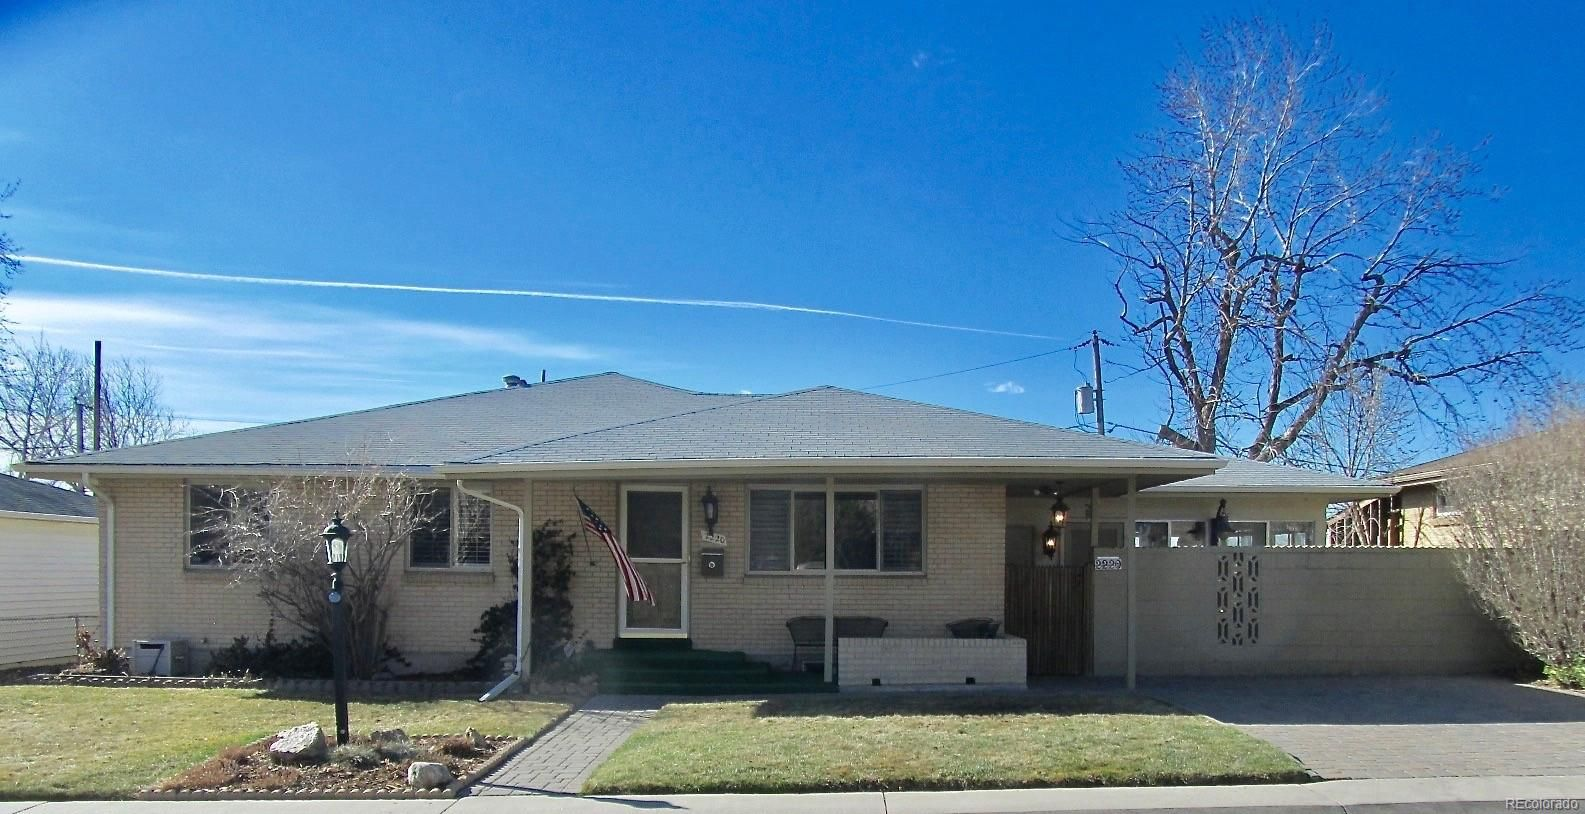 2220 W 82nd Pl, Denver, CO 80221 - Recently Sold | Trulia